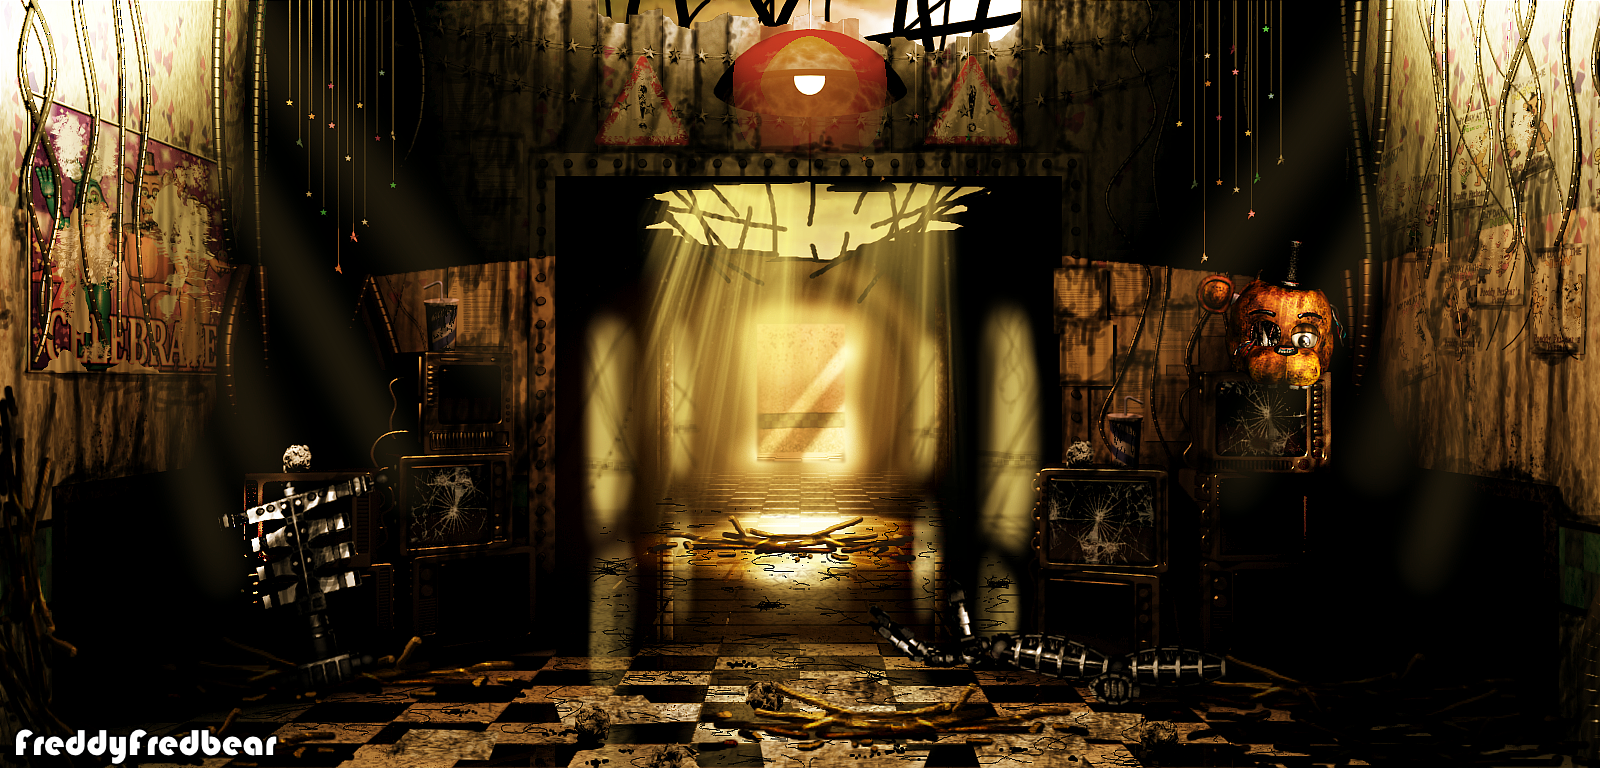 Abandoned Office - It Still Remains 2 Remake by FreddyFredbear